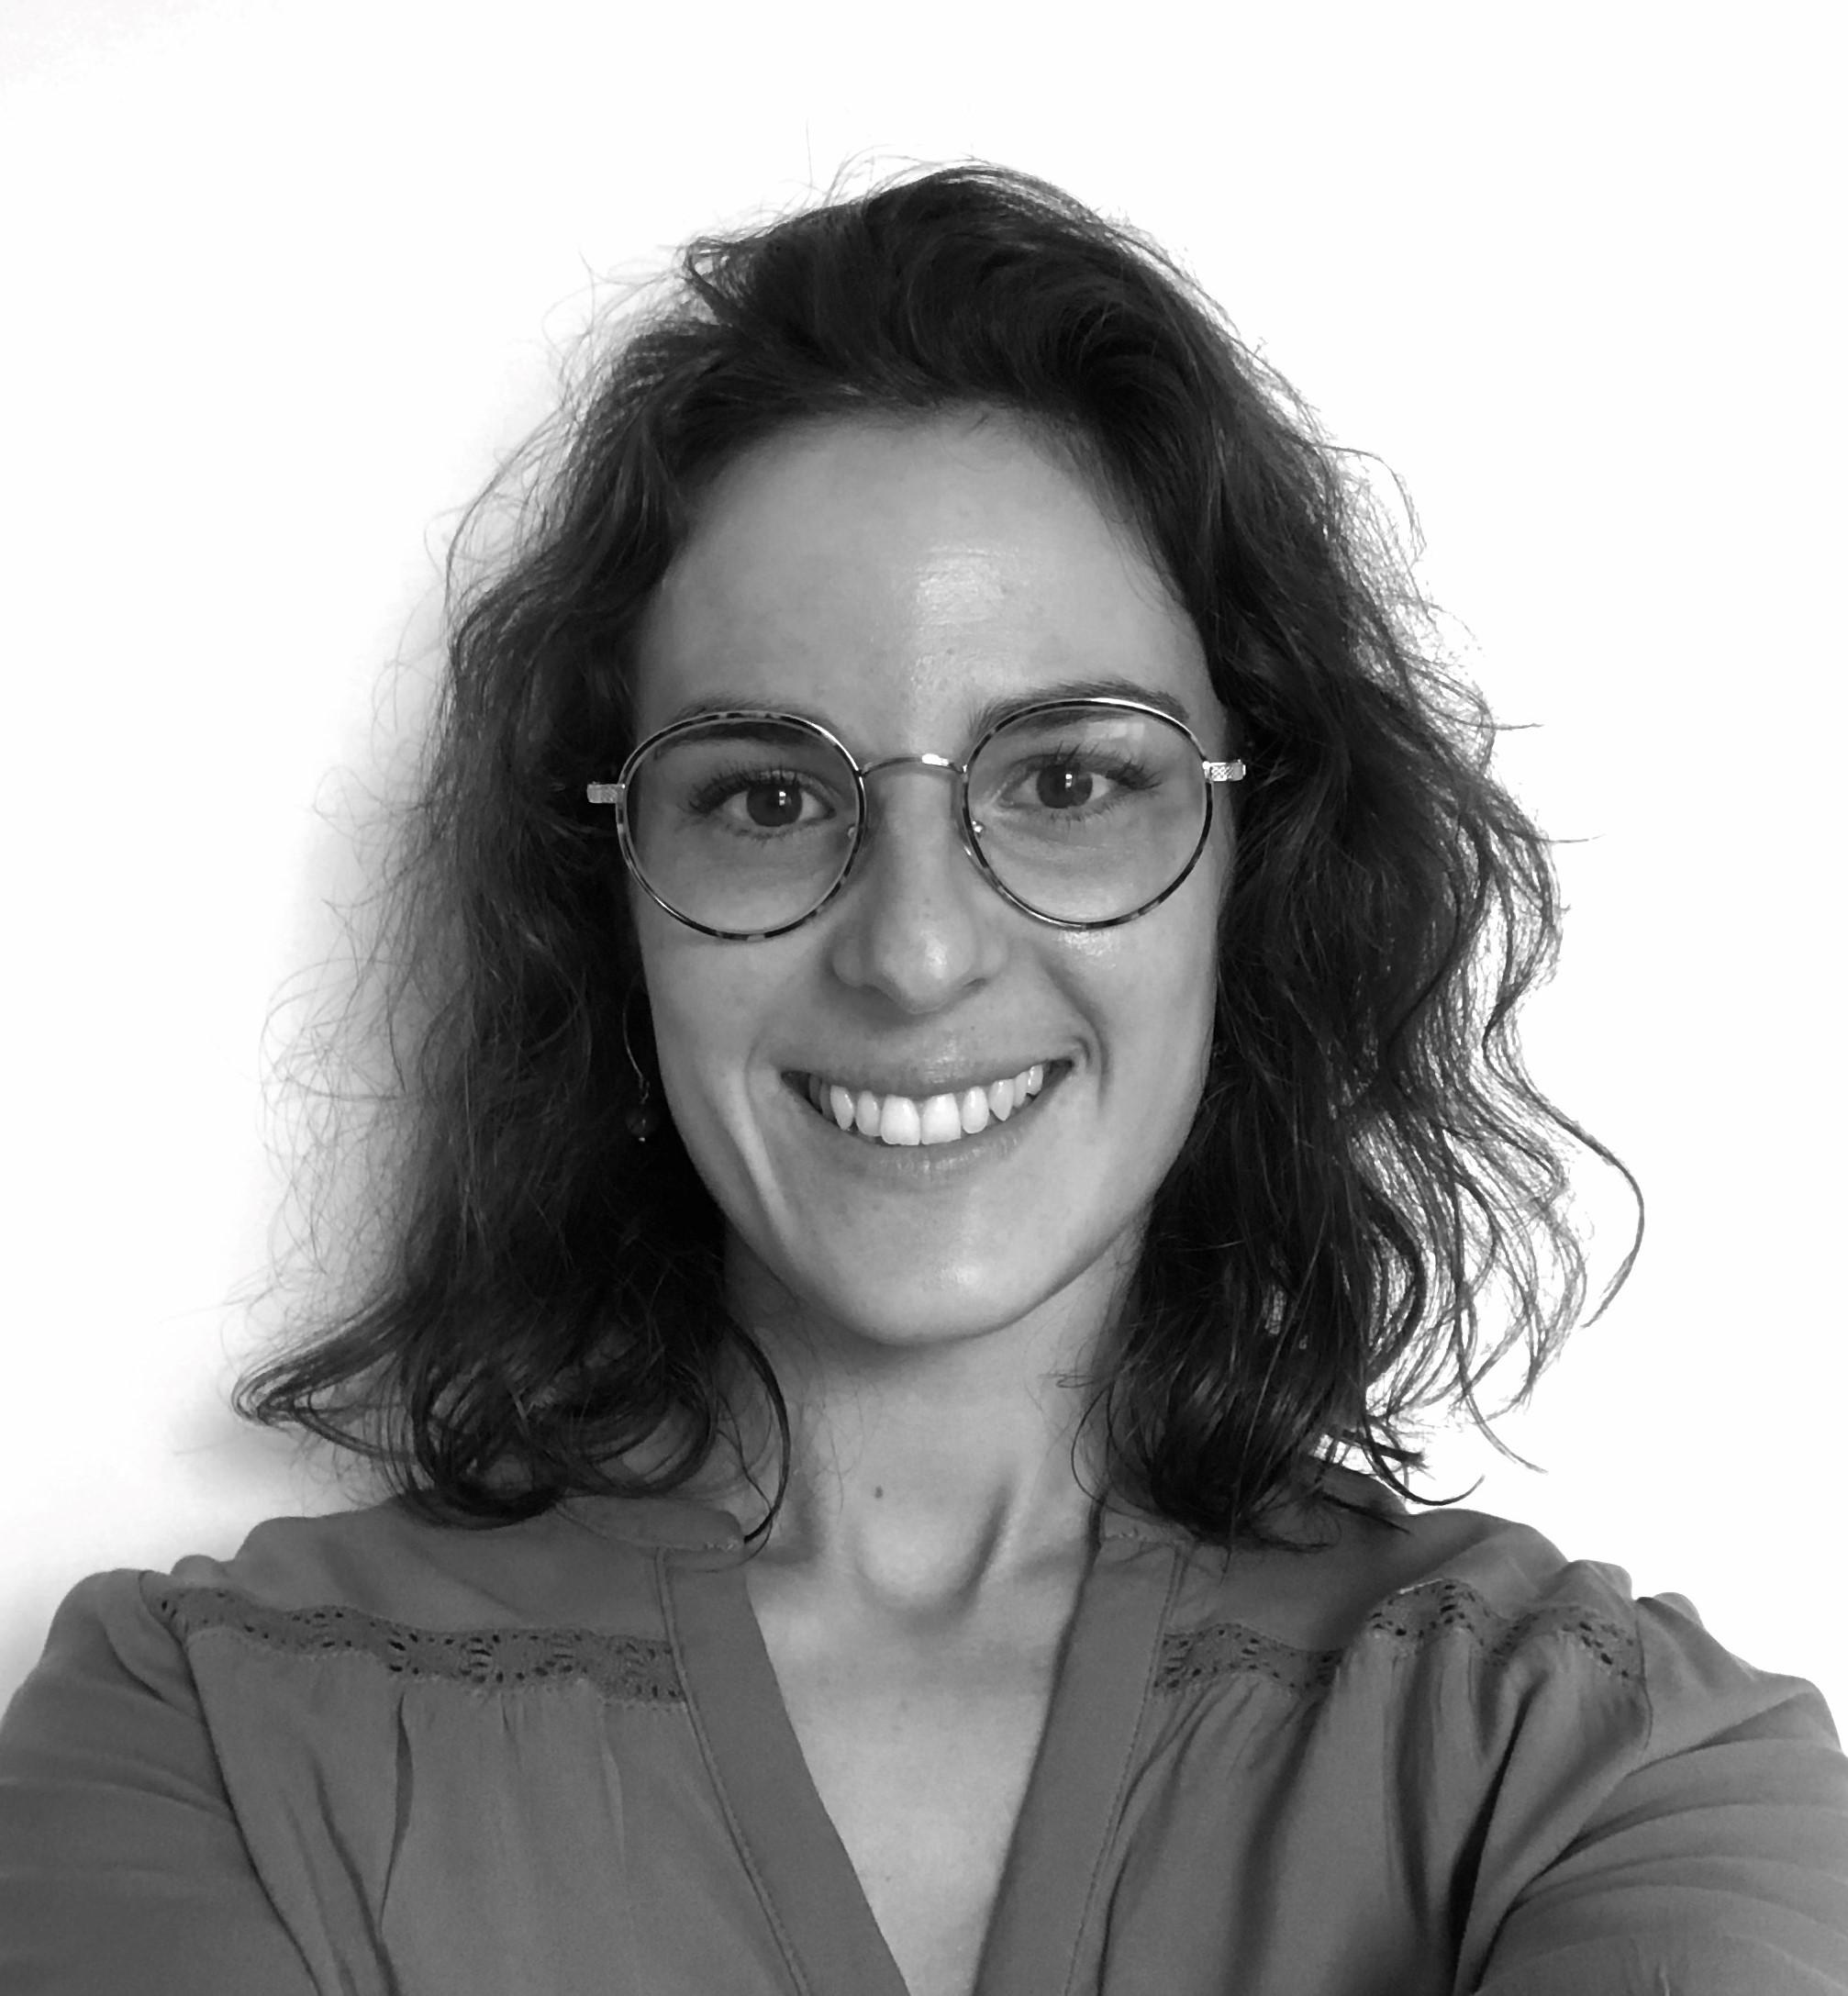 Charline Toffoletti